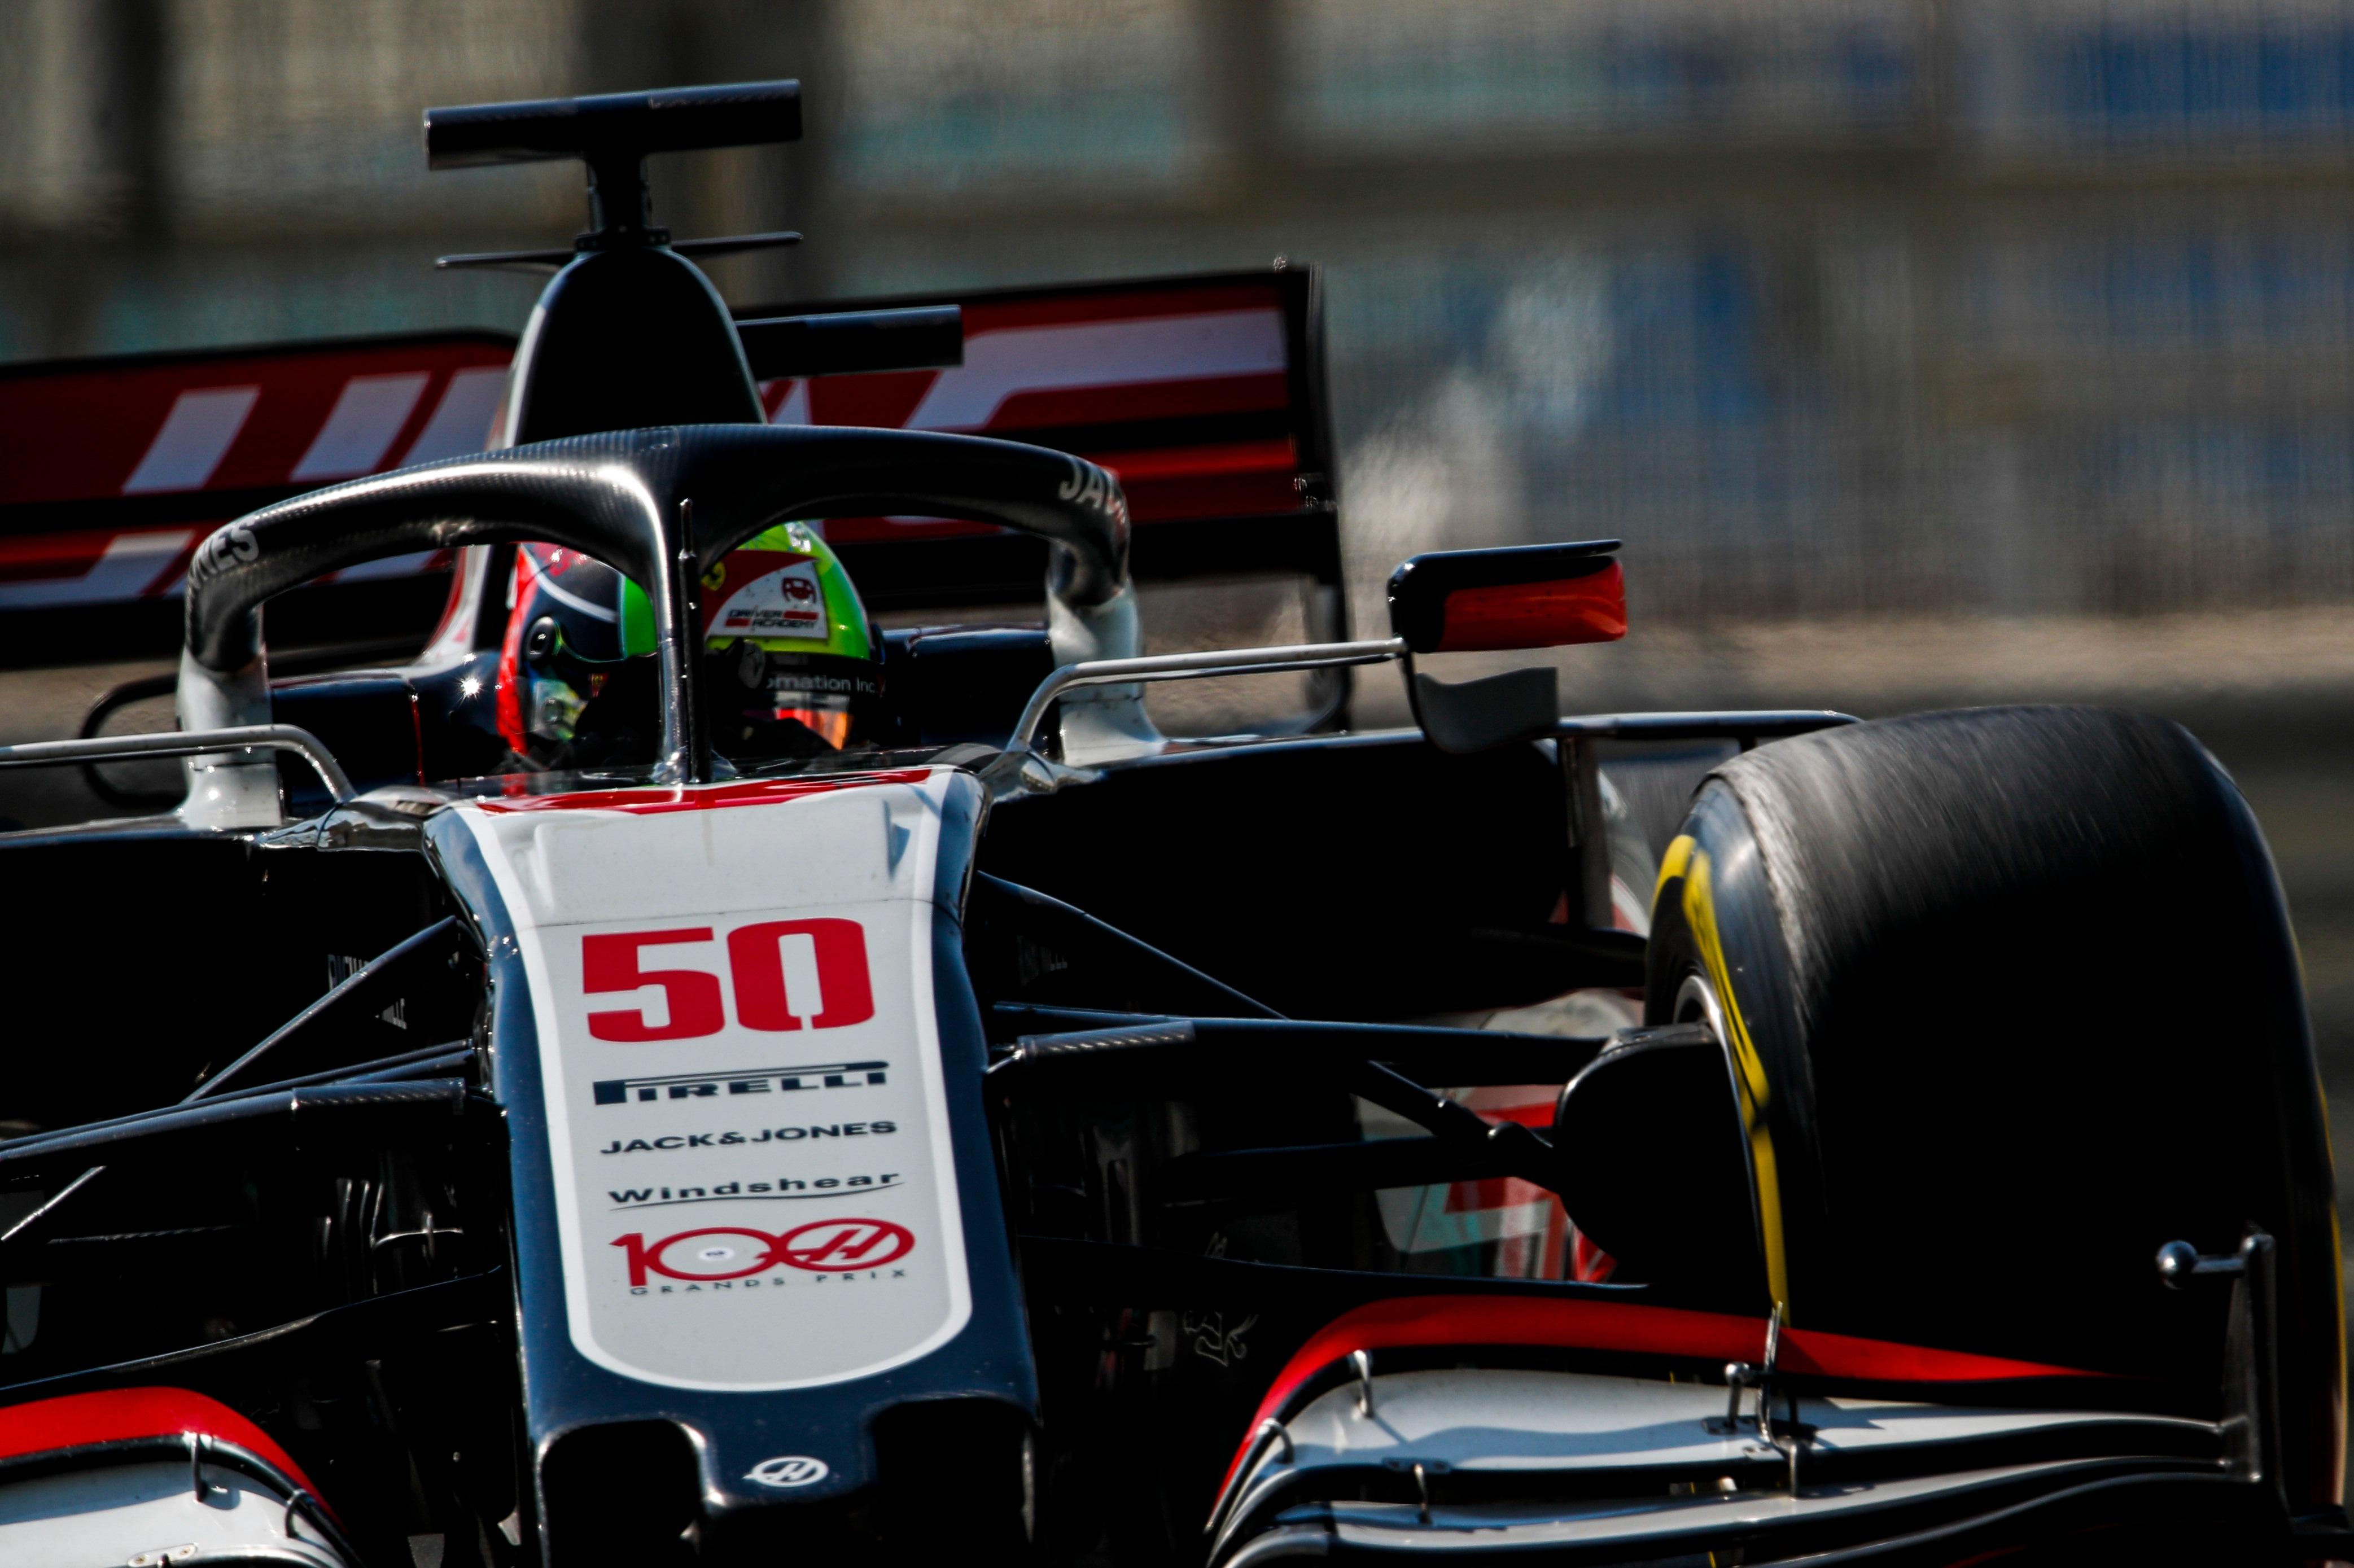 Mick Schumacher Abu Dhabi F1 test 2020